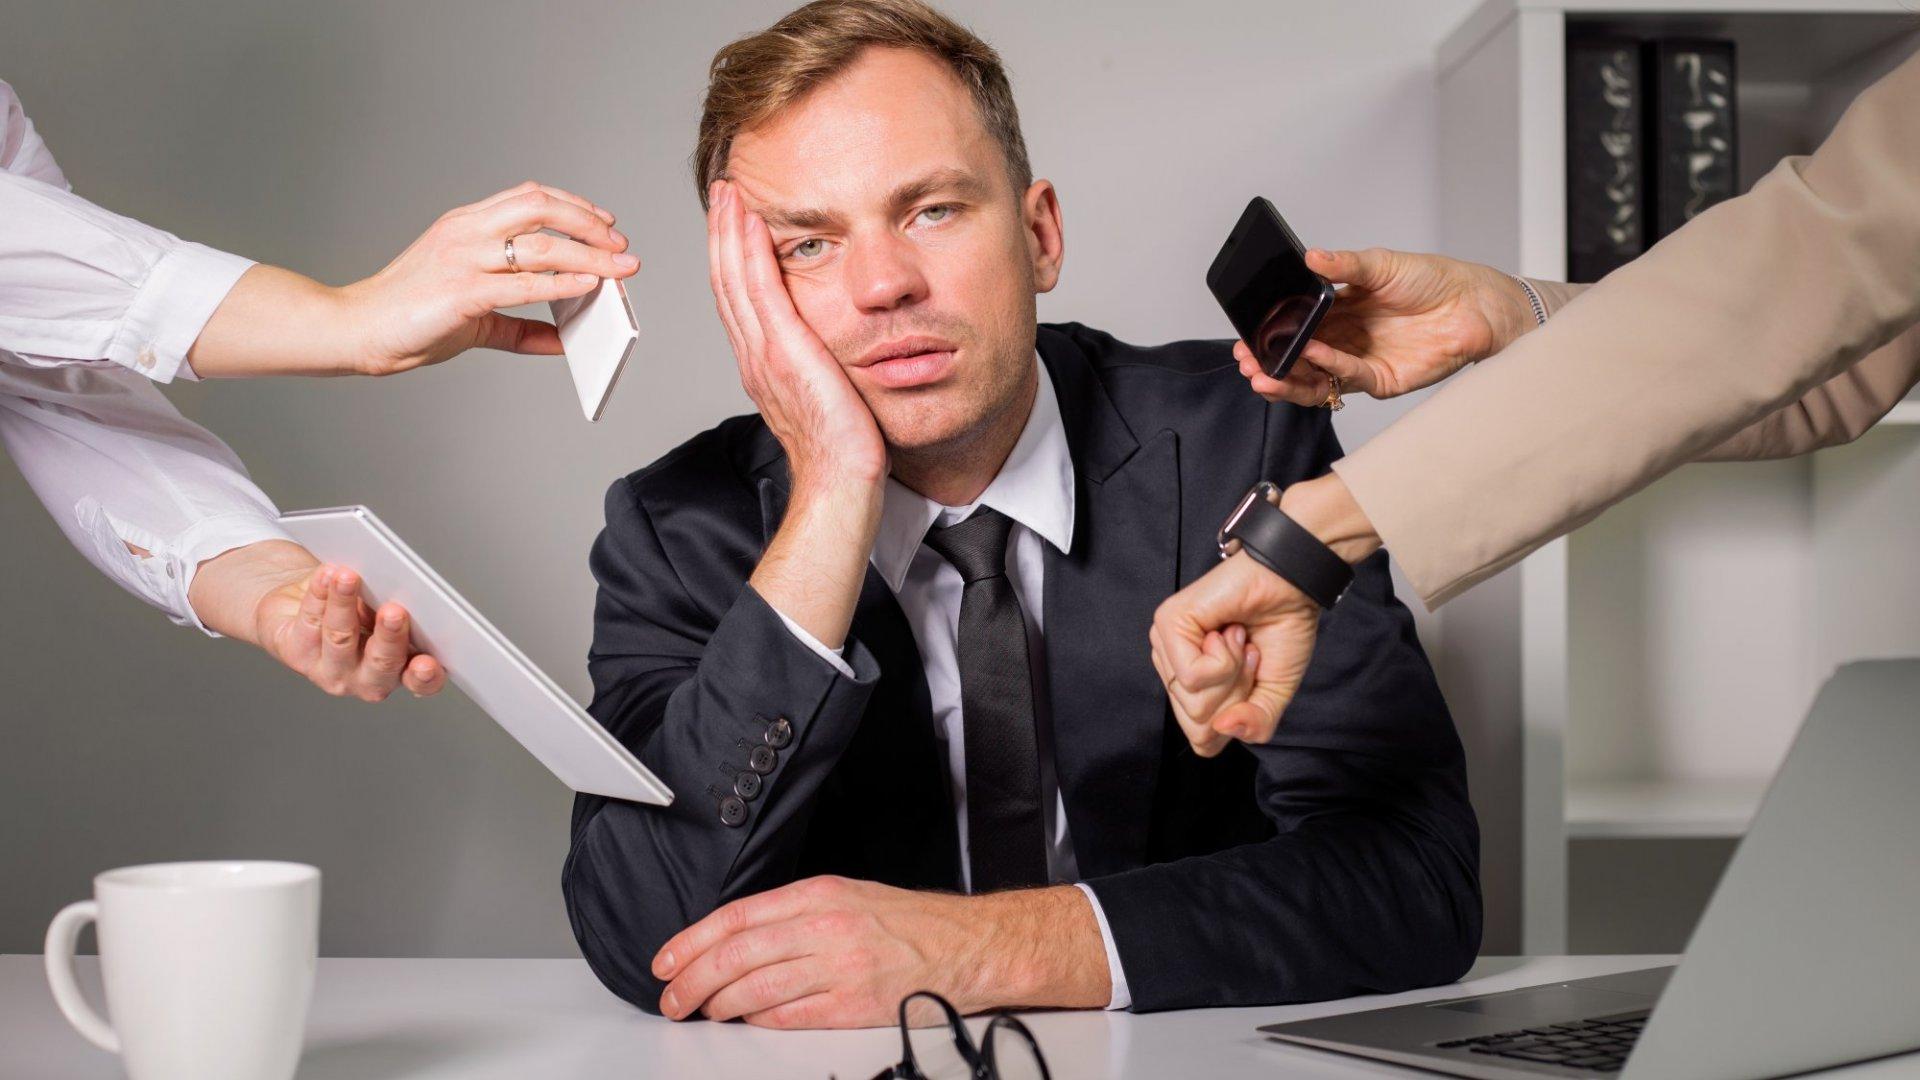 Job-Related Stress, Unhealthy Habits, and Work-Life Imbalance